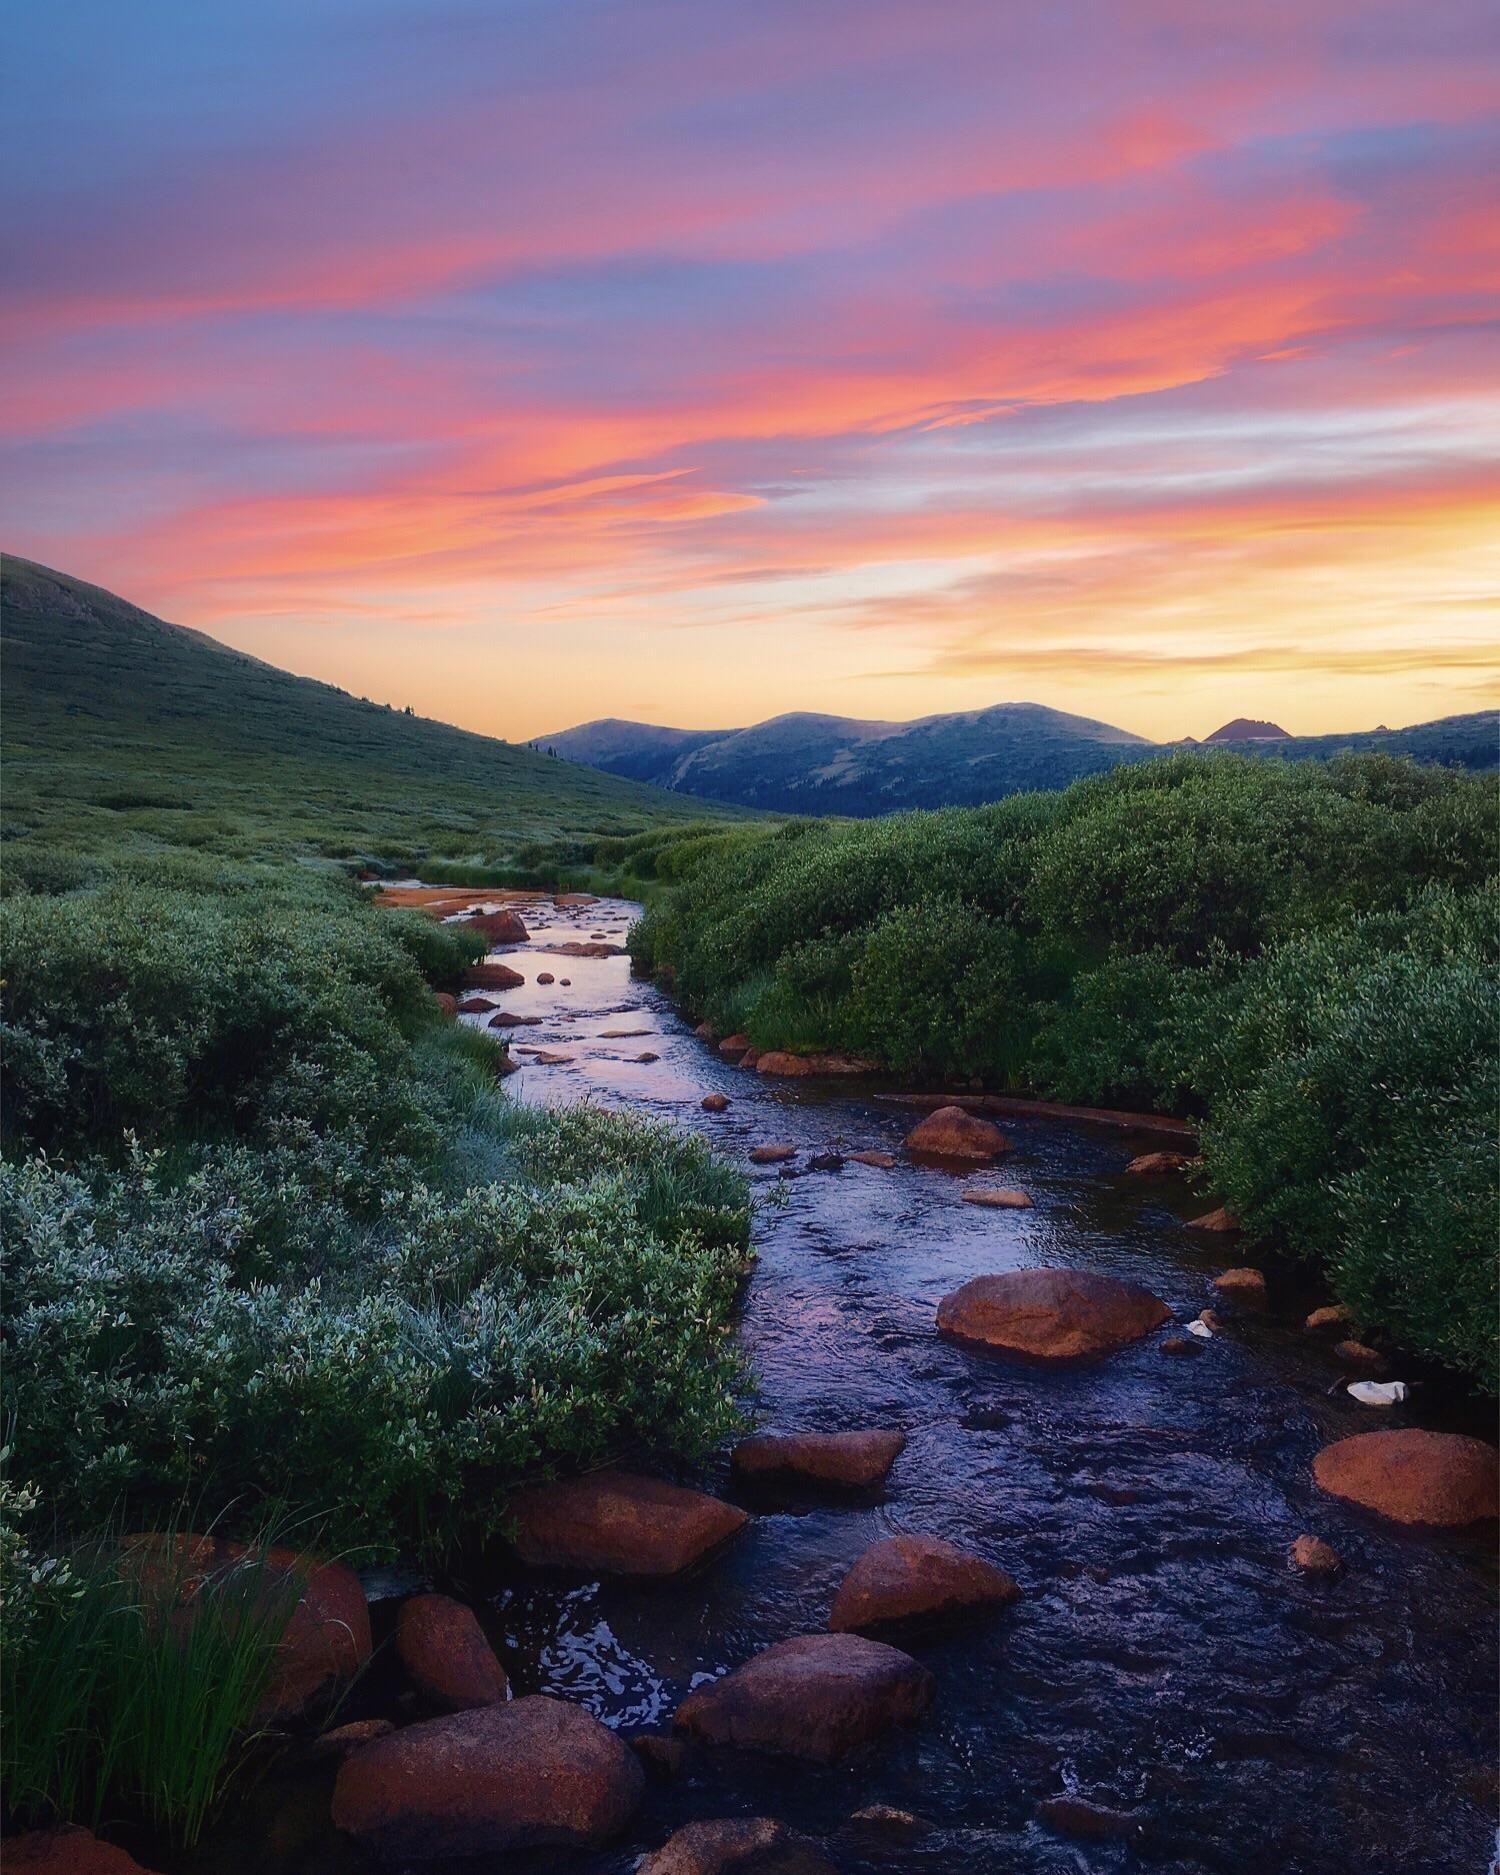 A Beautiful Summer Evening At Mount Bierstadt Colorado 1875x1500 Nature Photography Landscape Photography Nature Summer Landscape Landscape Photography